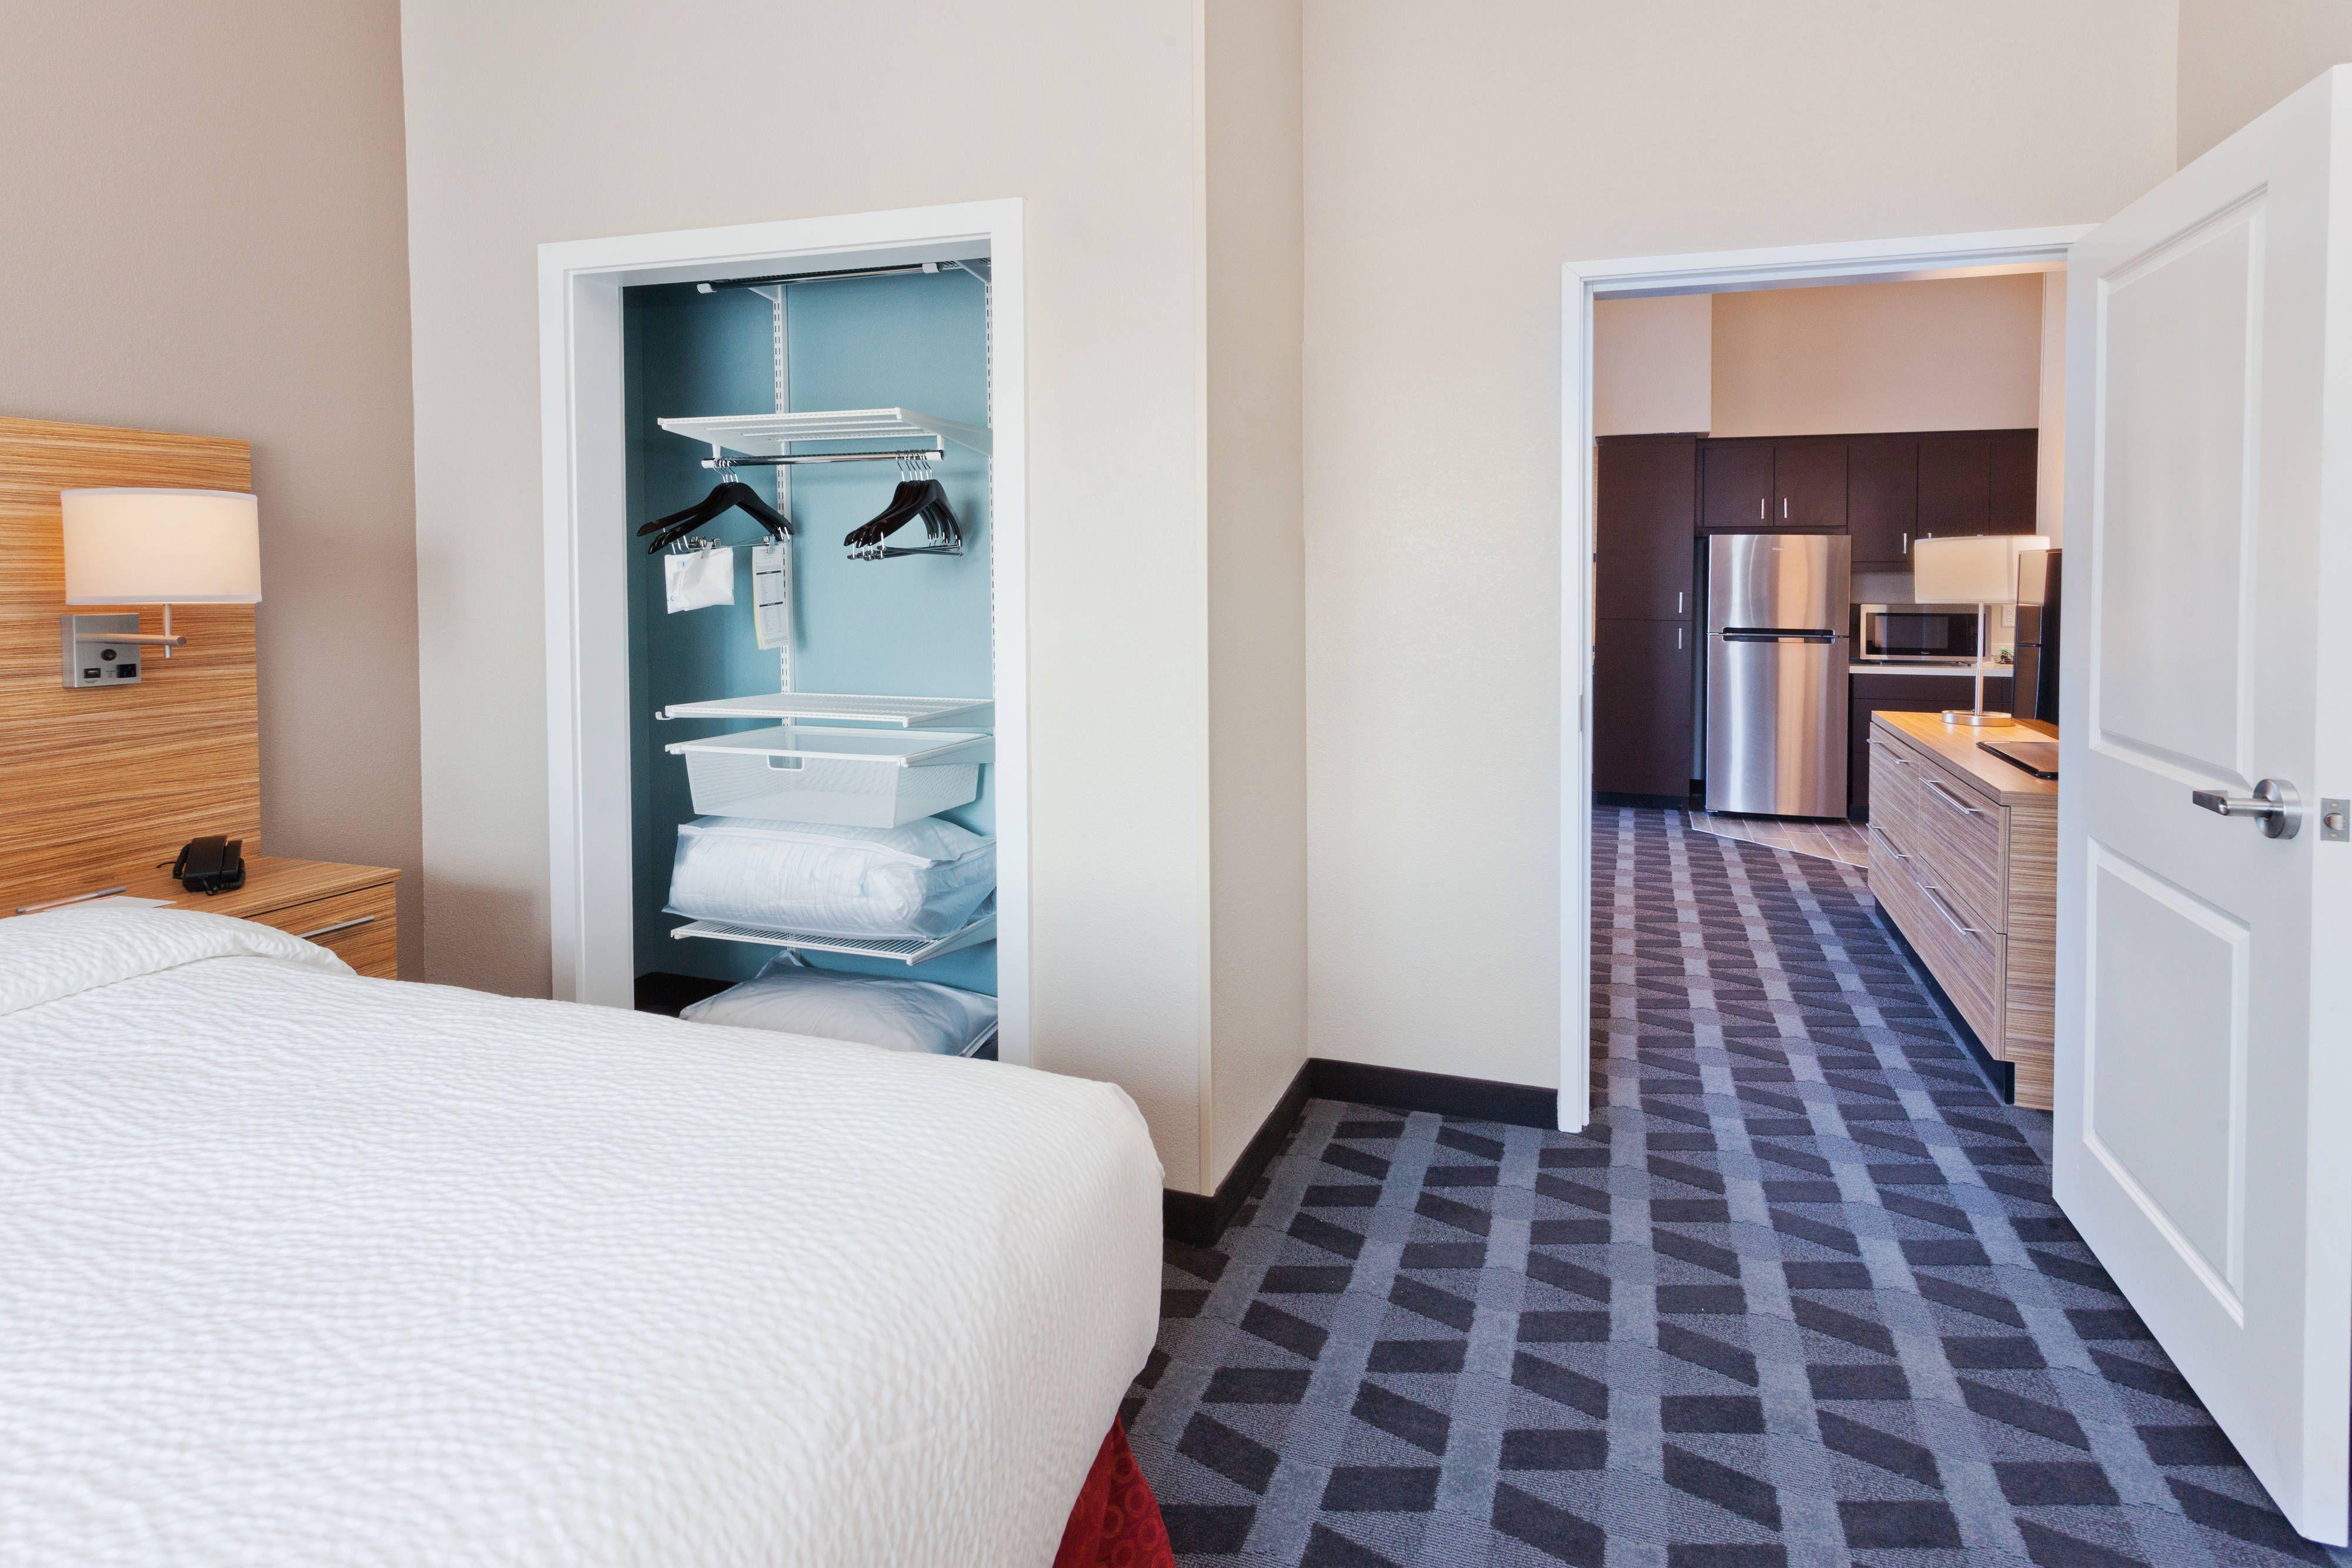 Towneplace Suites Dothan One Bedroom Suite Beautiful Guestbathroom Visiting Suites Bedroom Suite One Bedroom